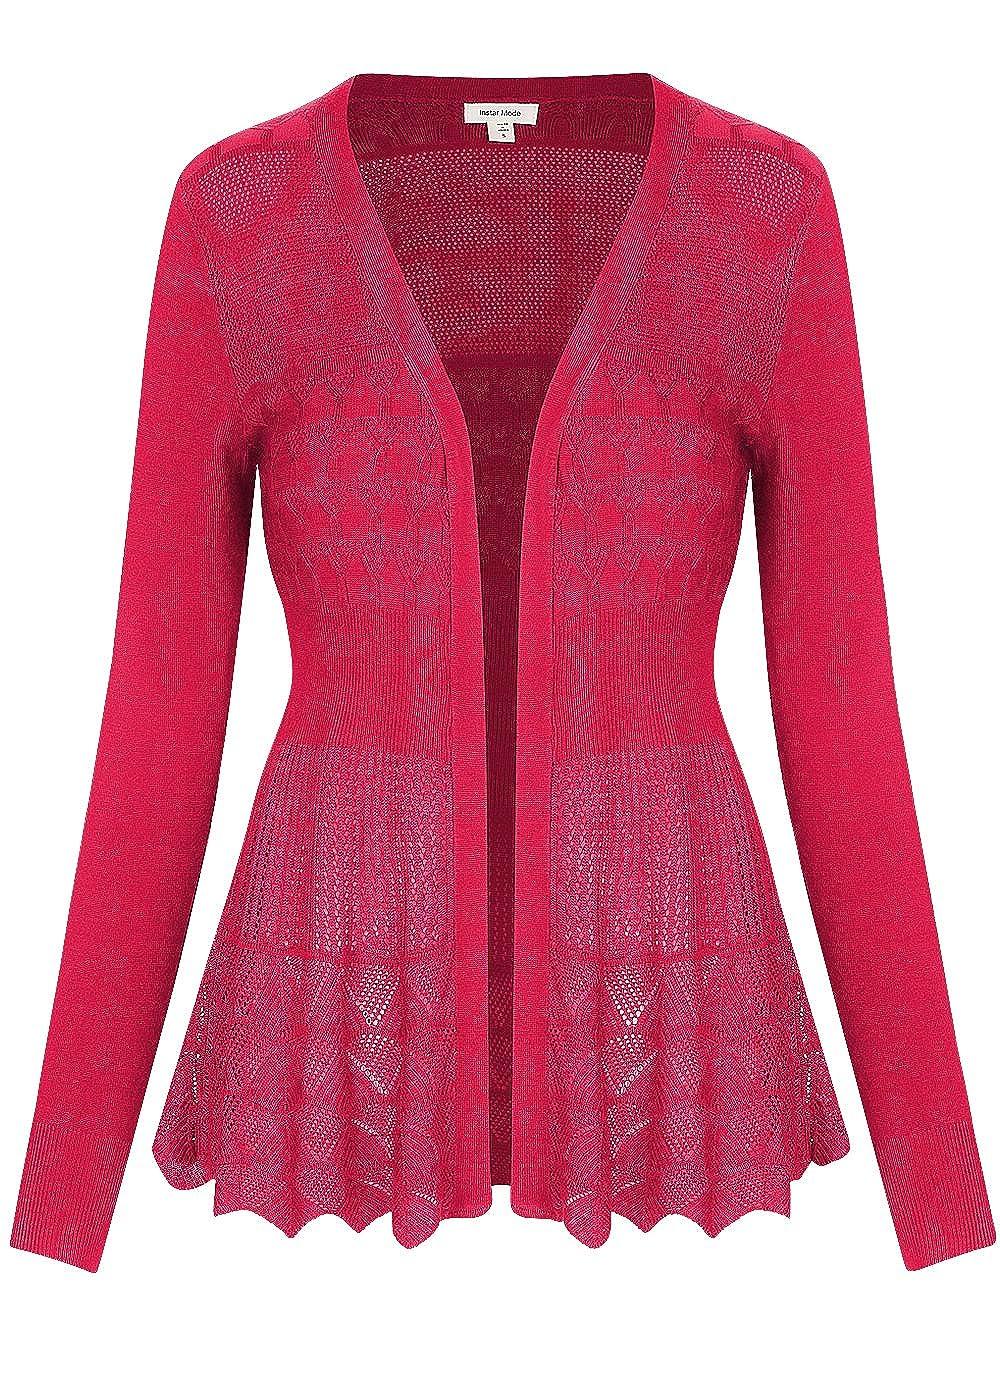 C09115 Coral Instar Mode InstarMode Women's Long Sleeve Crochet Knit Sweater Draped Open Cardigan